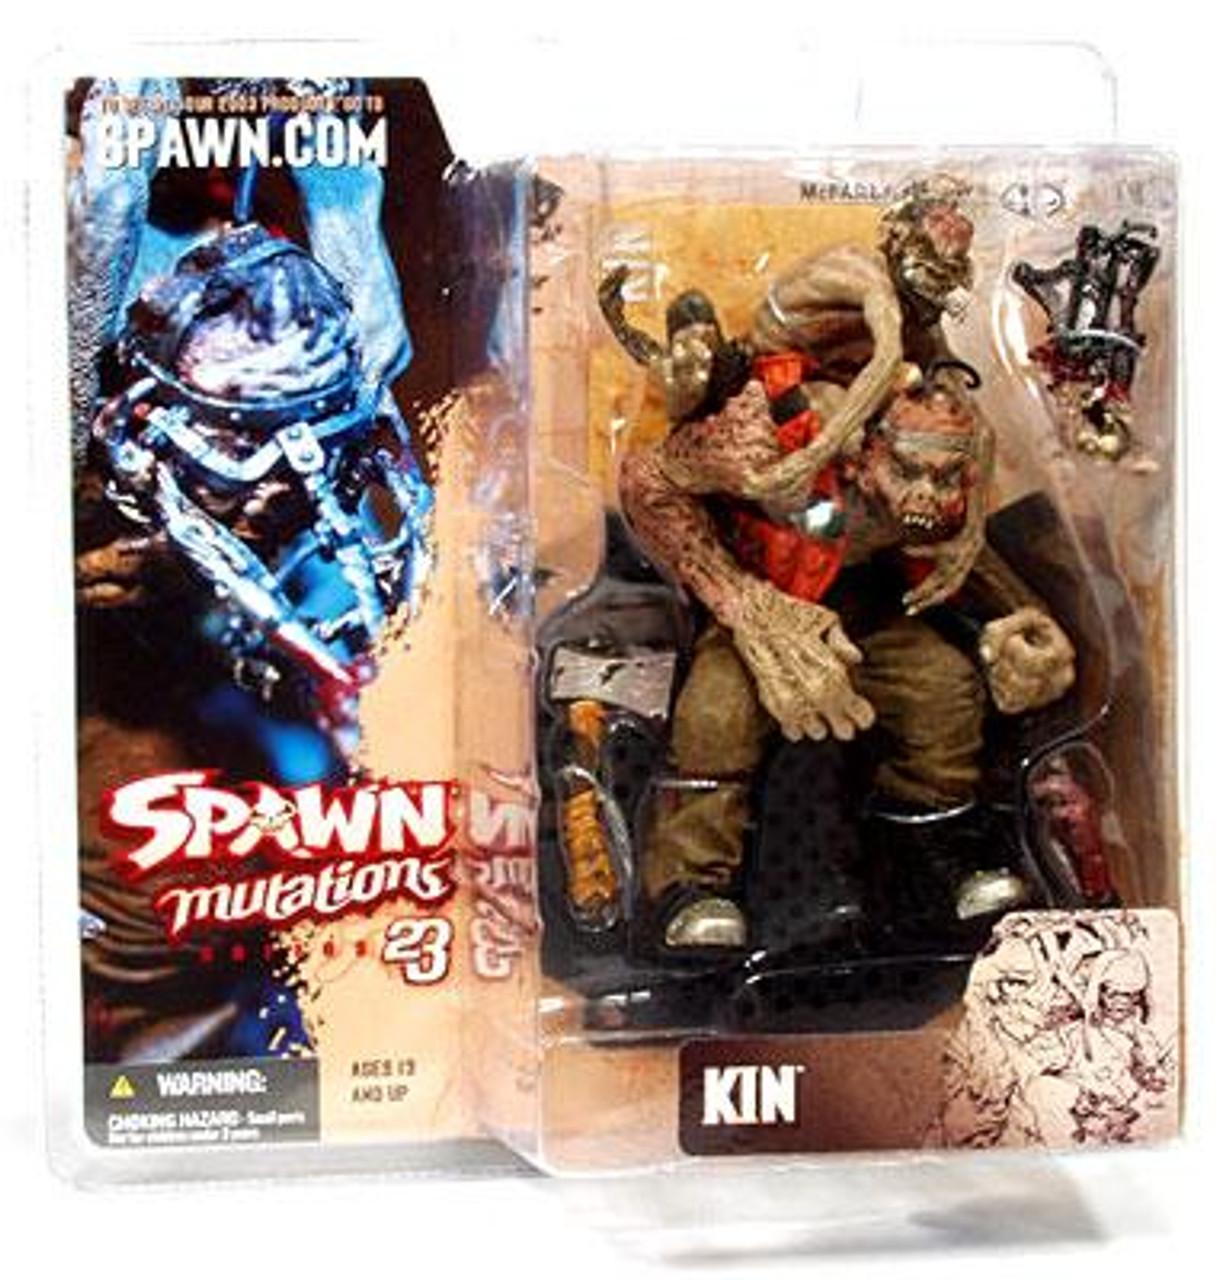 McFarlane Toys Spawn Series 23 Mutations Kin Action Figure